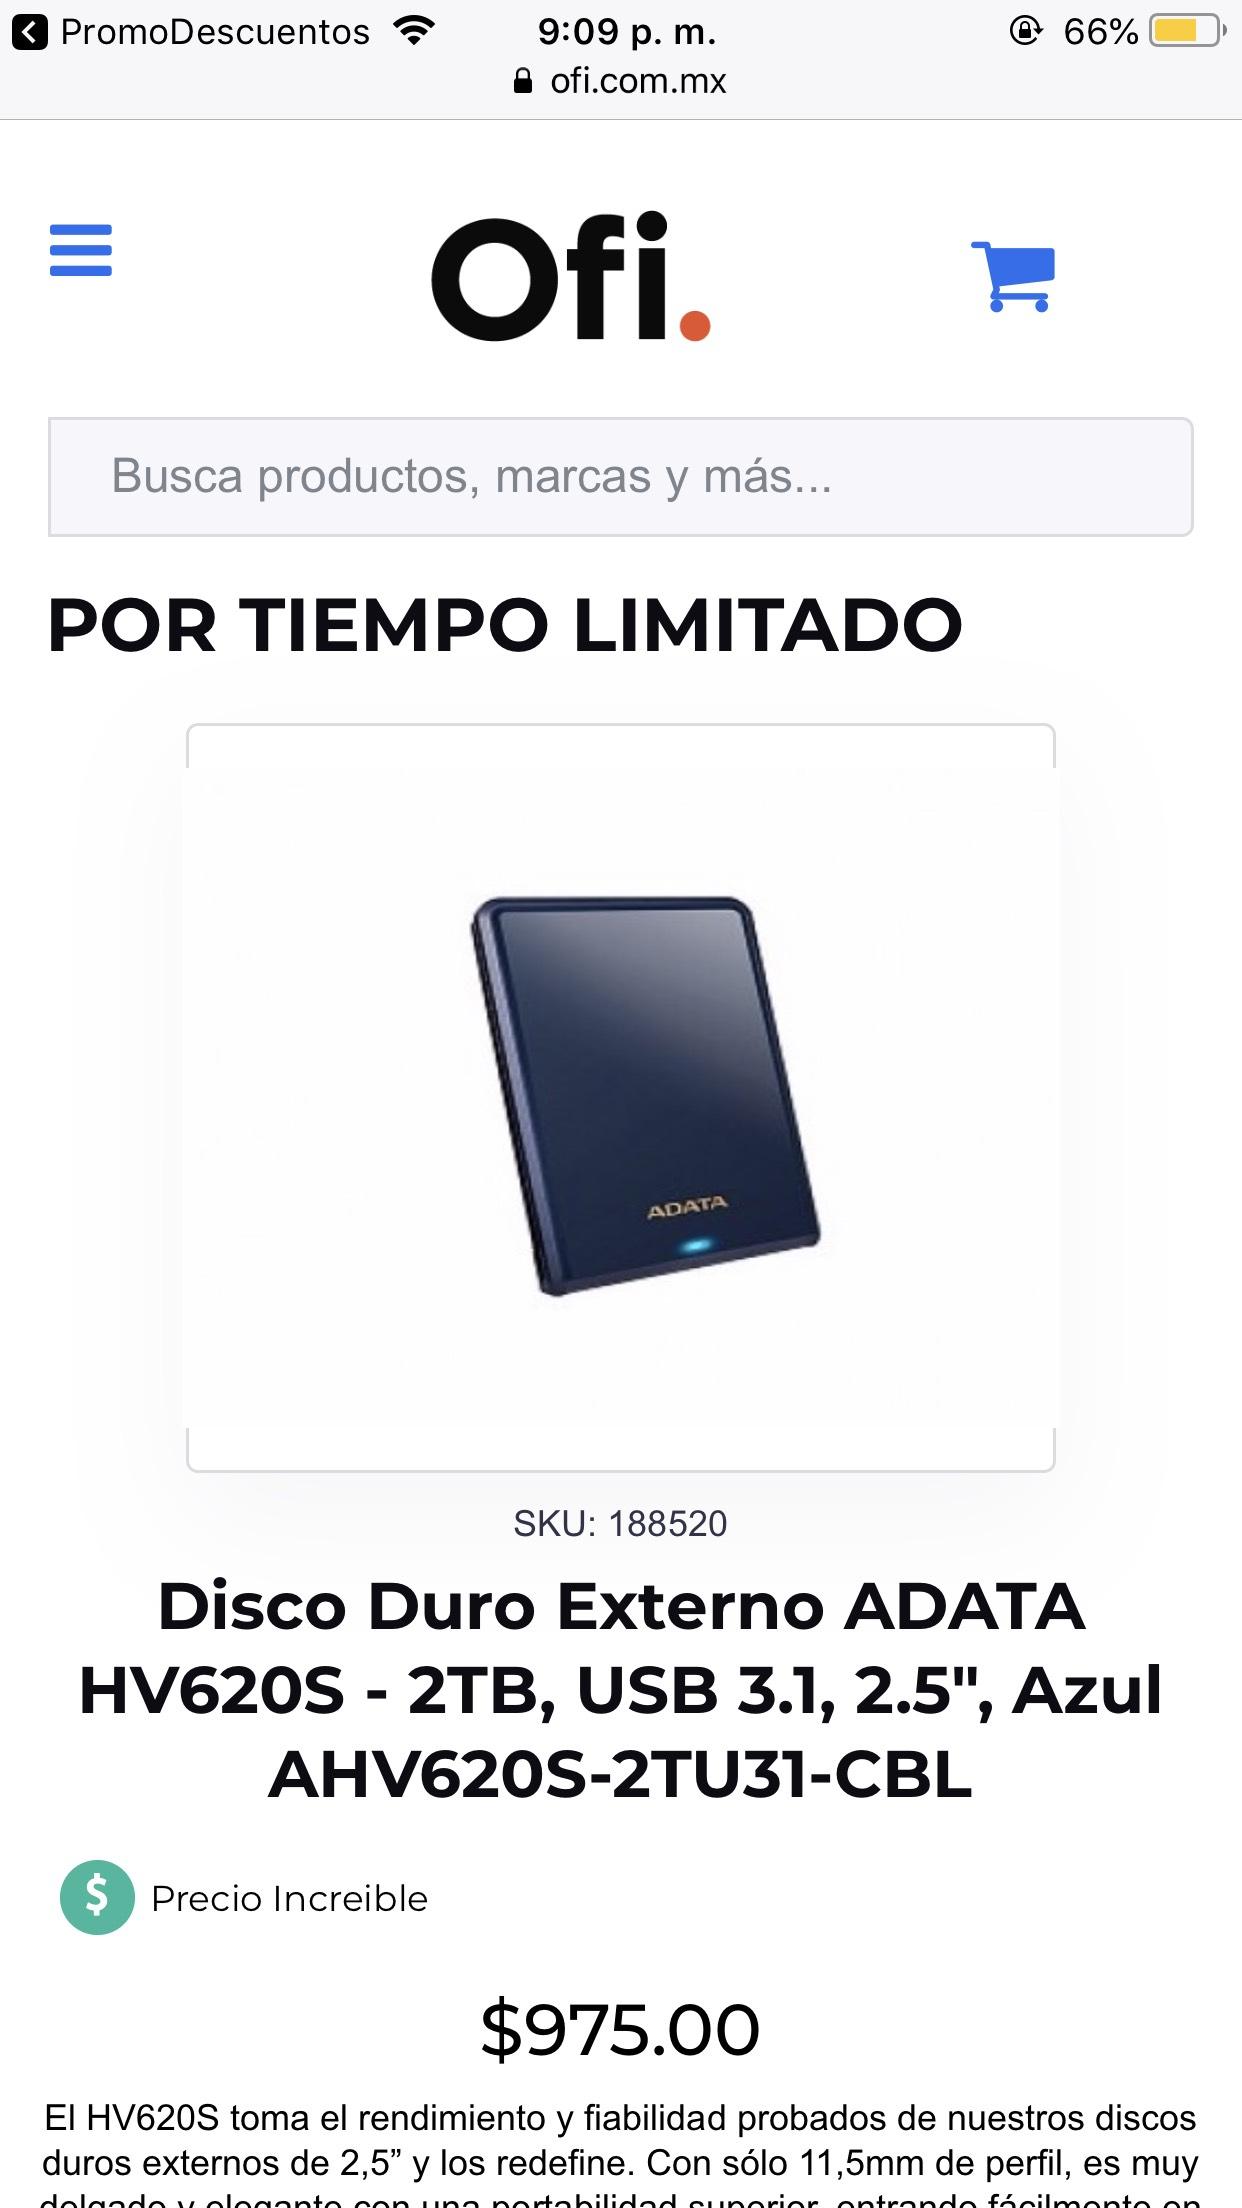 Ofi: Disco duro 2tb en súper precio!!!